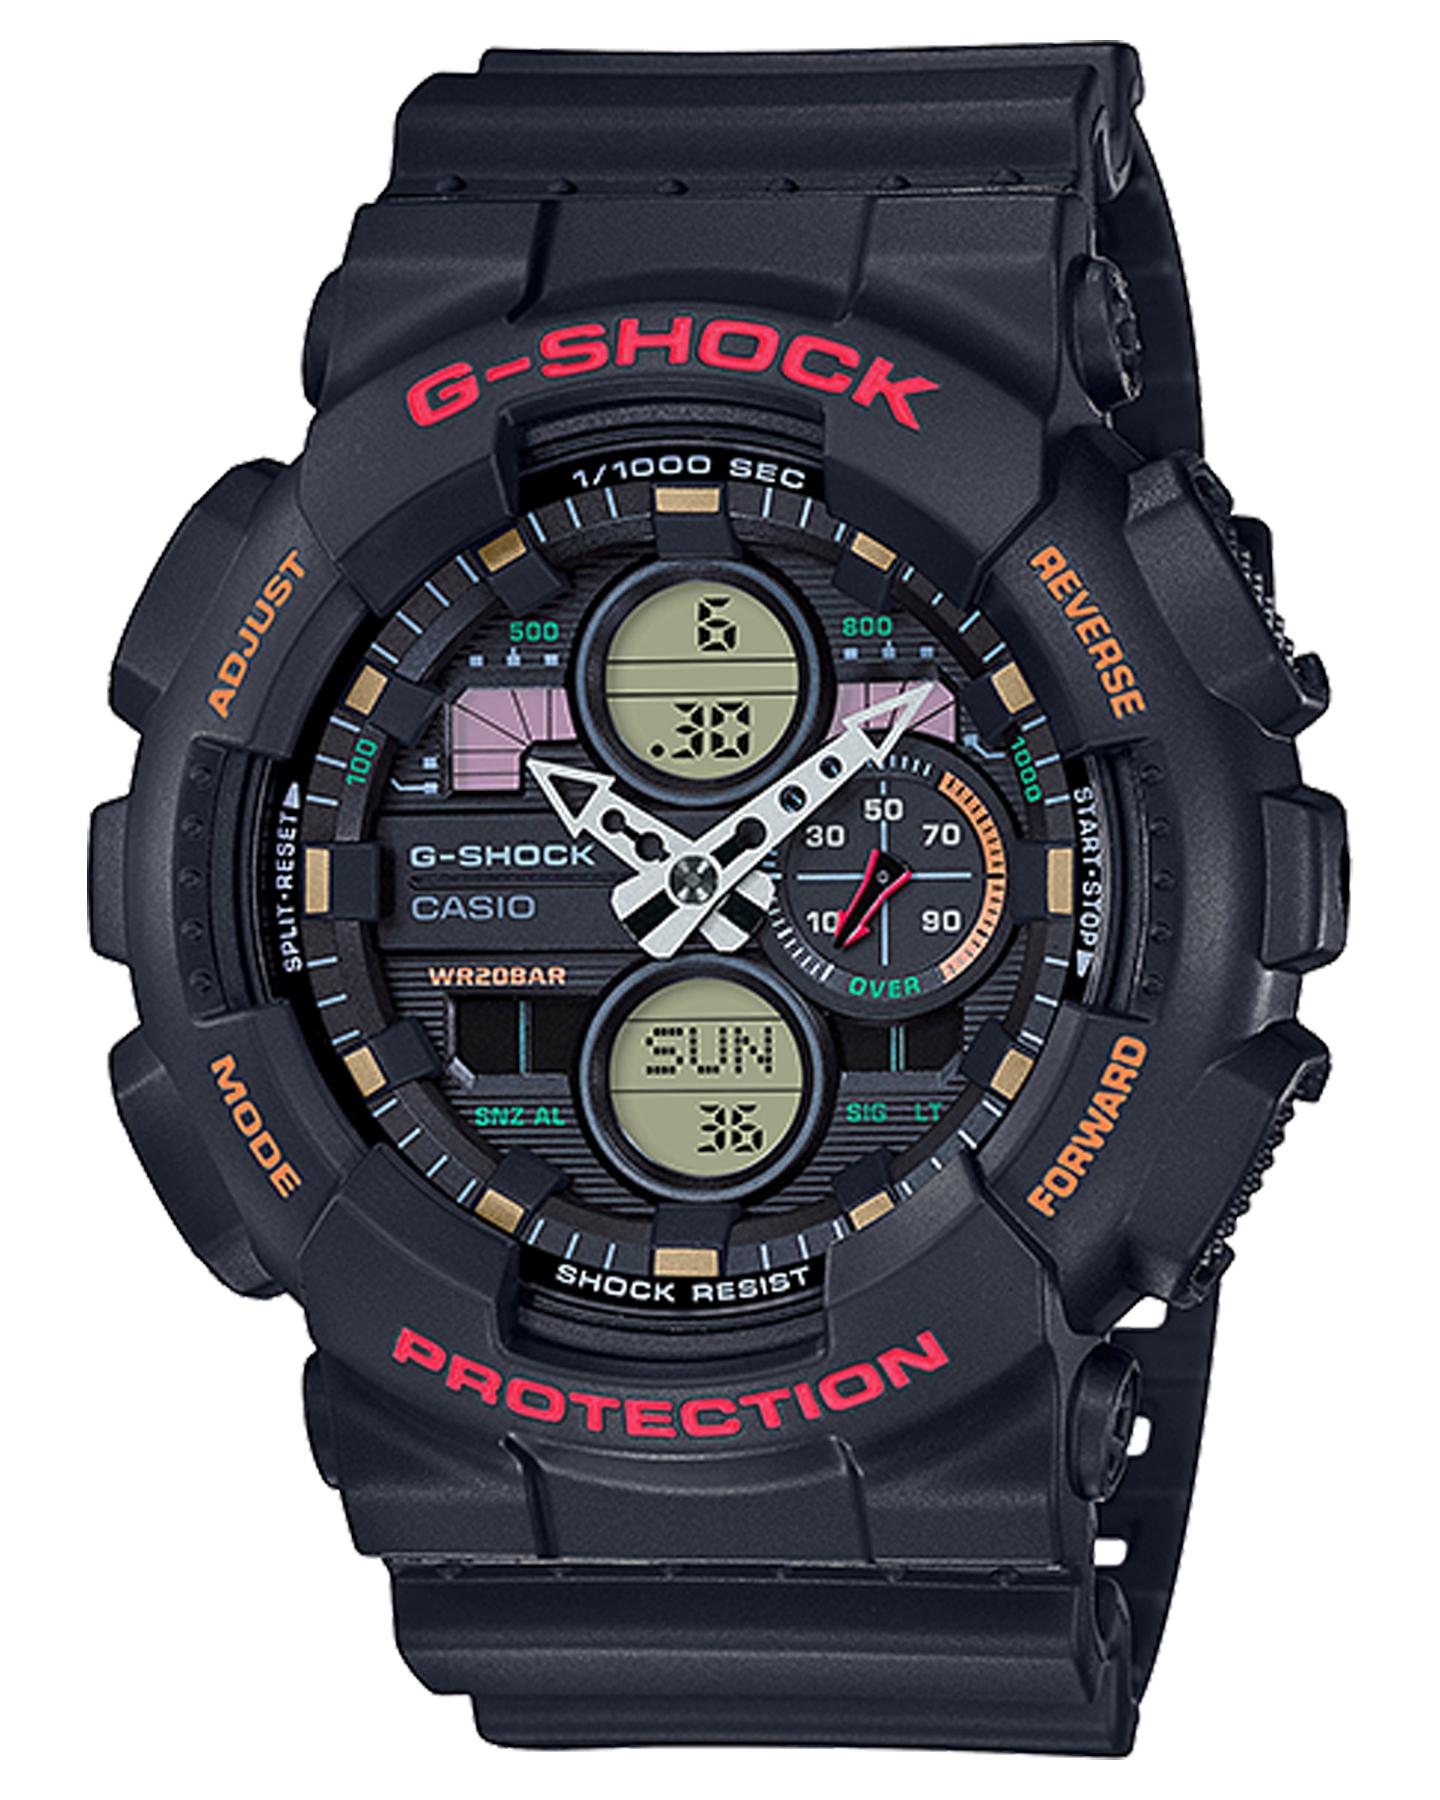 G Shock Ga140 Analog Digital Watch Black Red